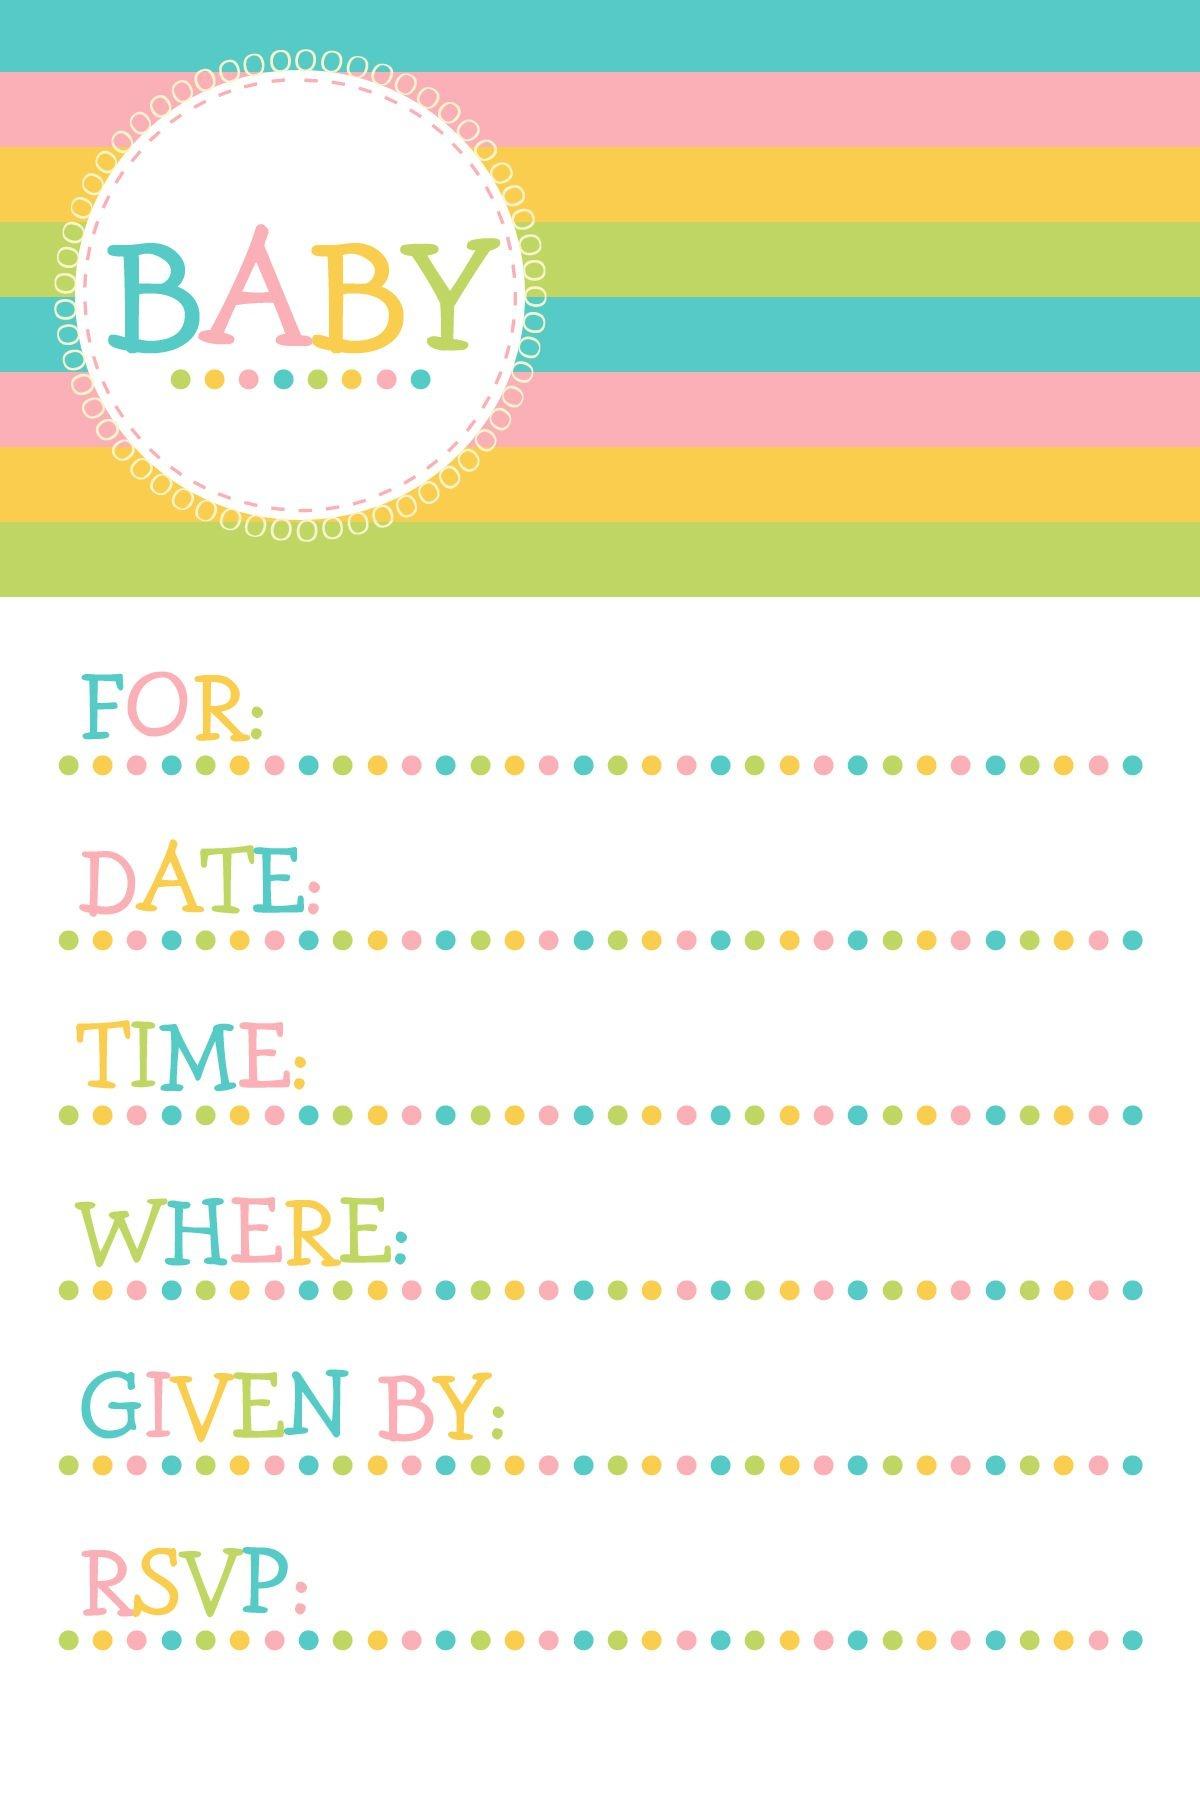 25 Adorable Free Printable Baby Shower Invitations - Free Printable Baby Sprinkle Invitations